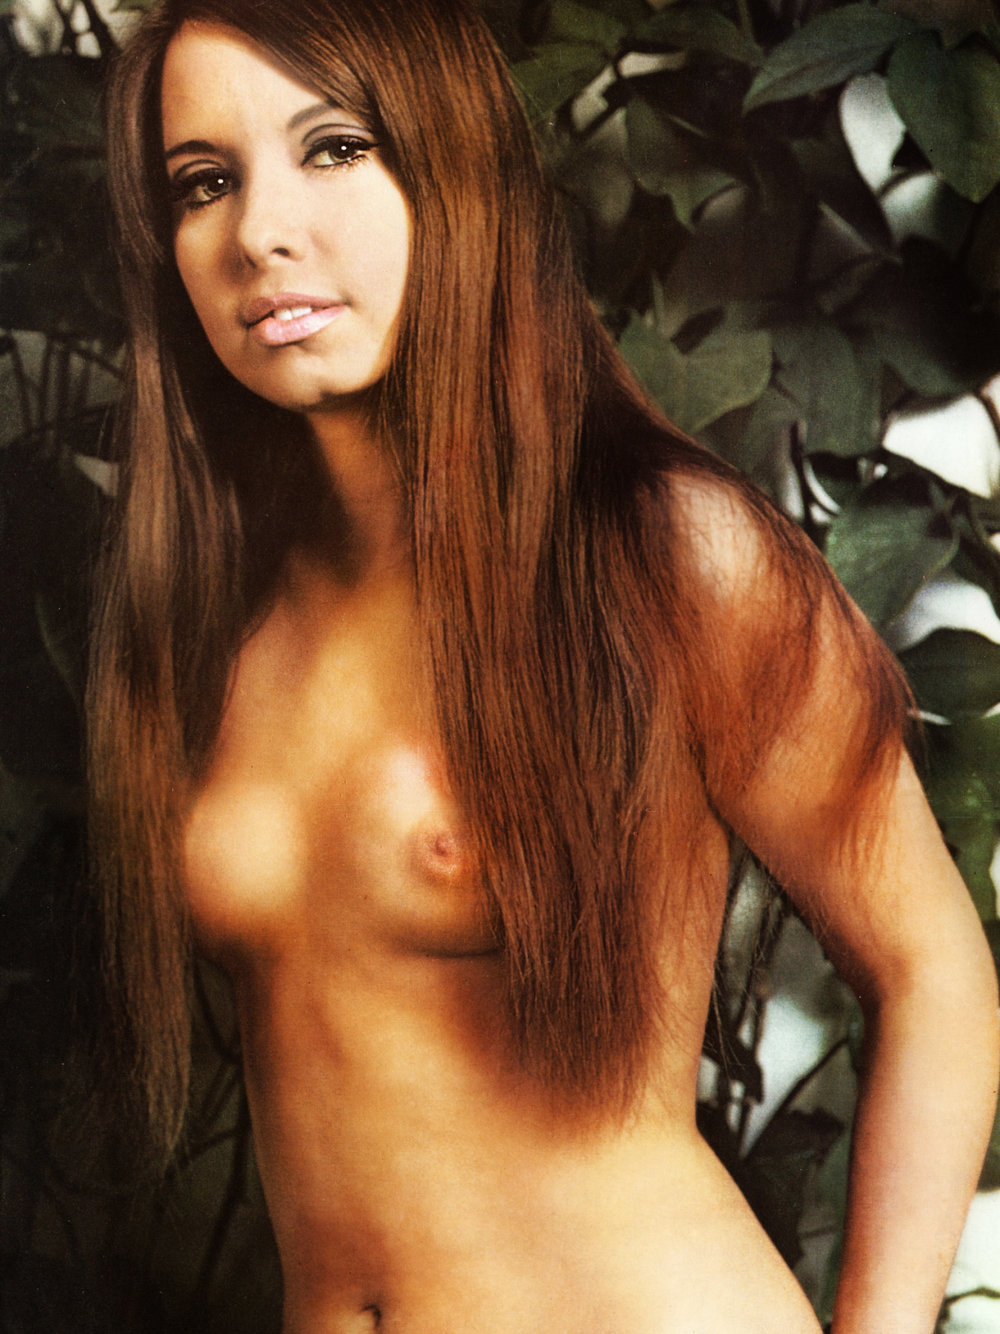 10 birgitta-eliasson-Lach-magazine-1968.jpg